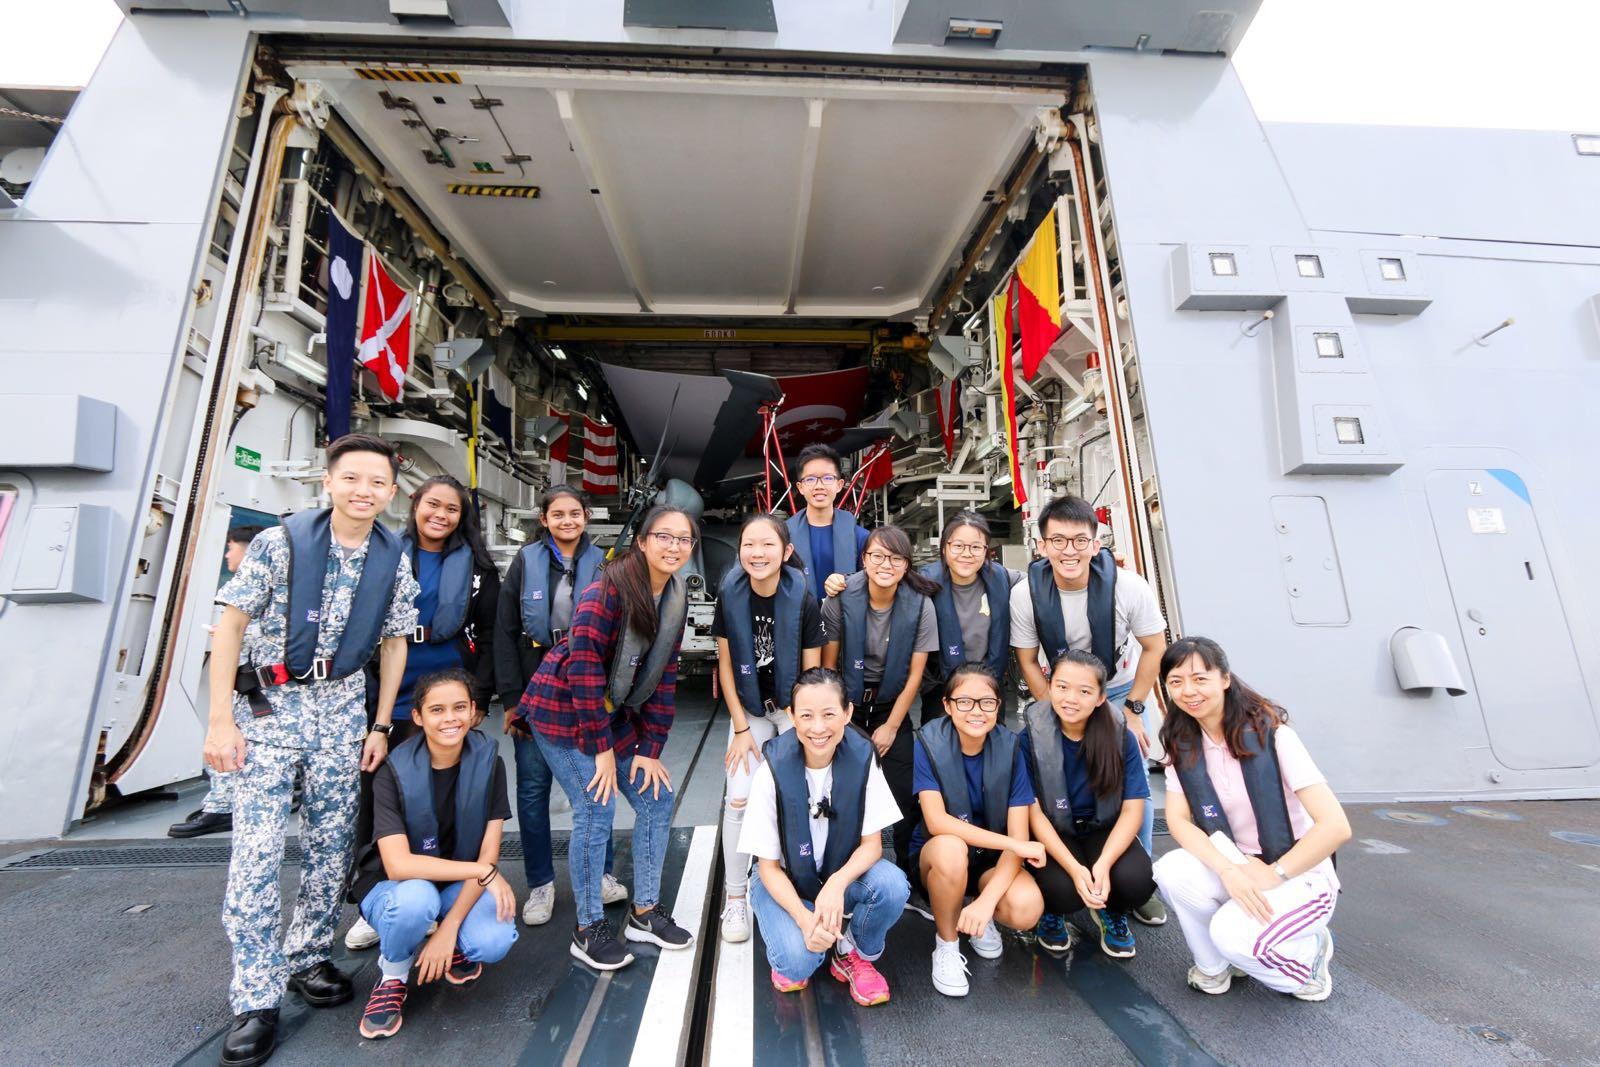 A fieldtrip on aboard a Navy ship!